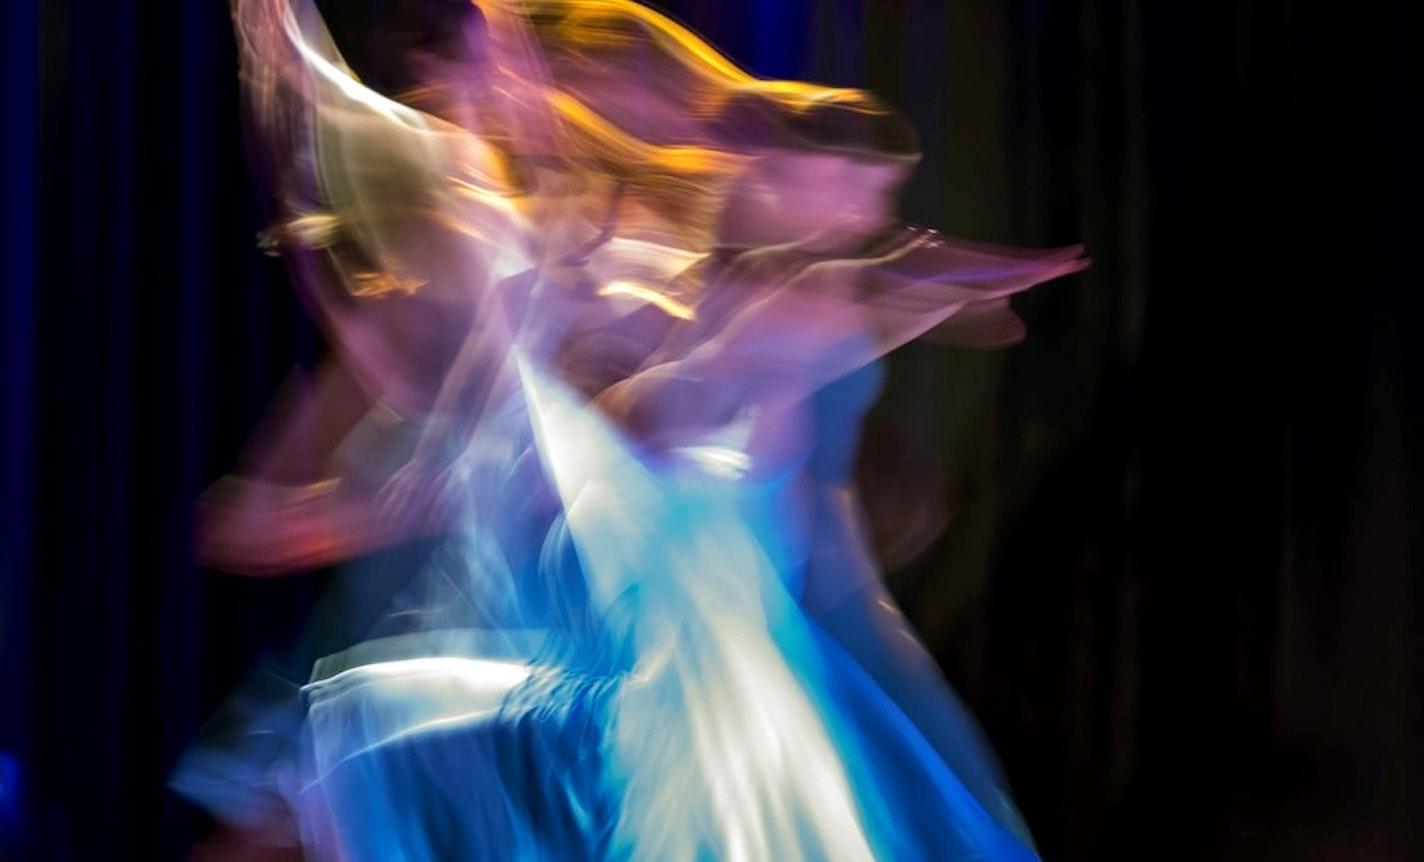 Recalculating: A Conscious Dance Practice